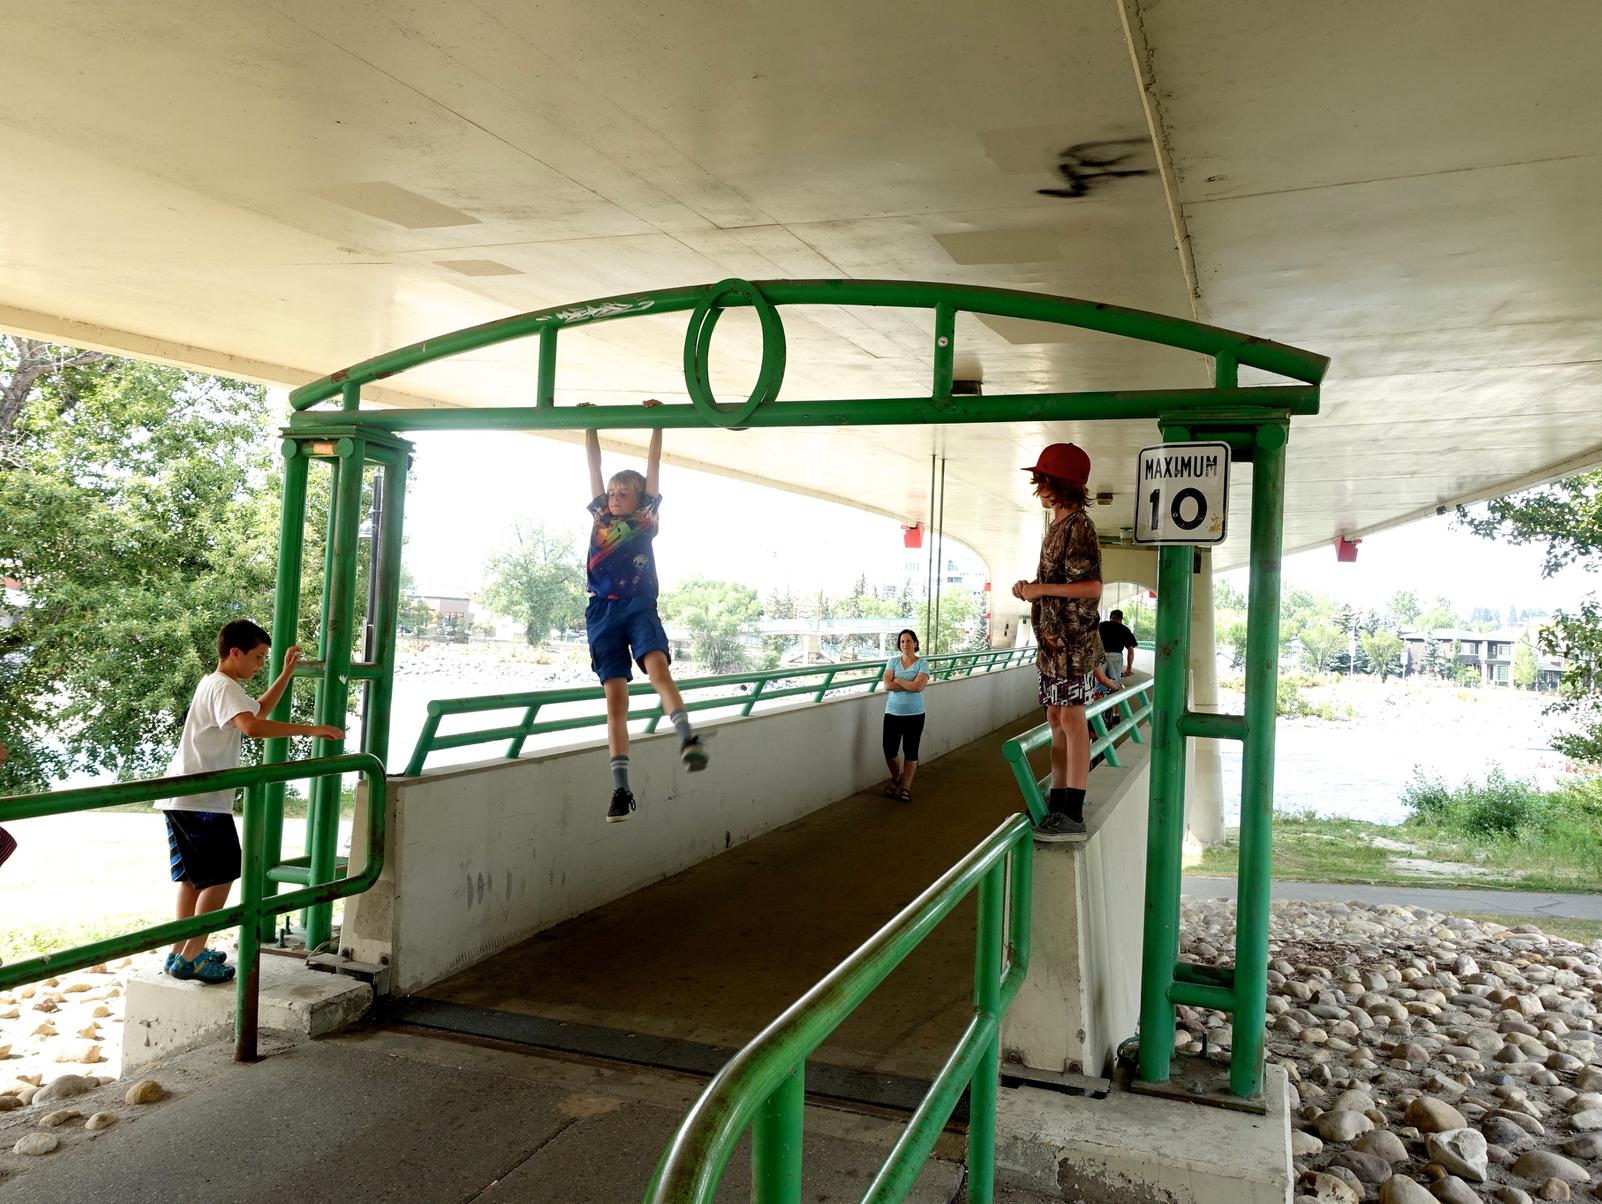 Eau Claire's other pedestrian bridge is also a playground.